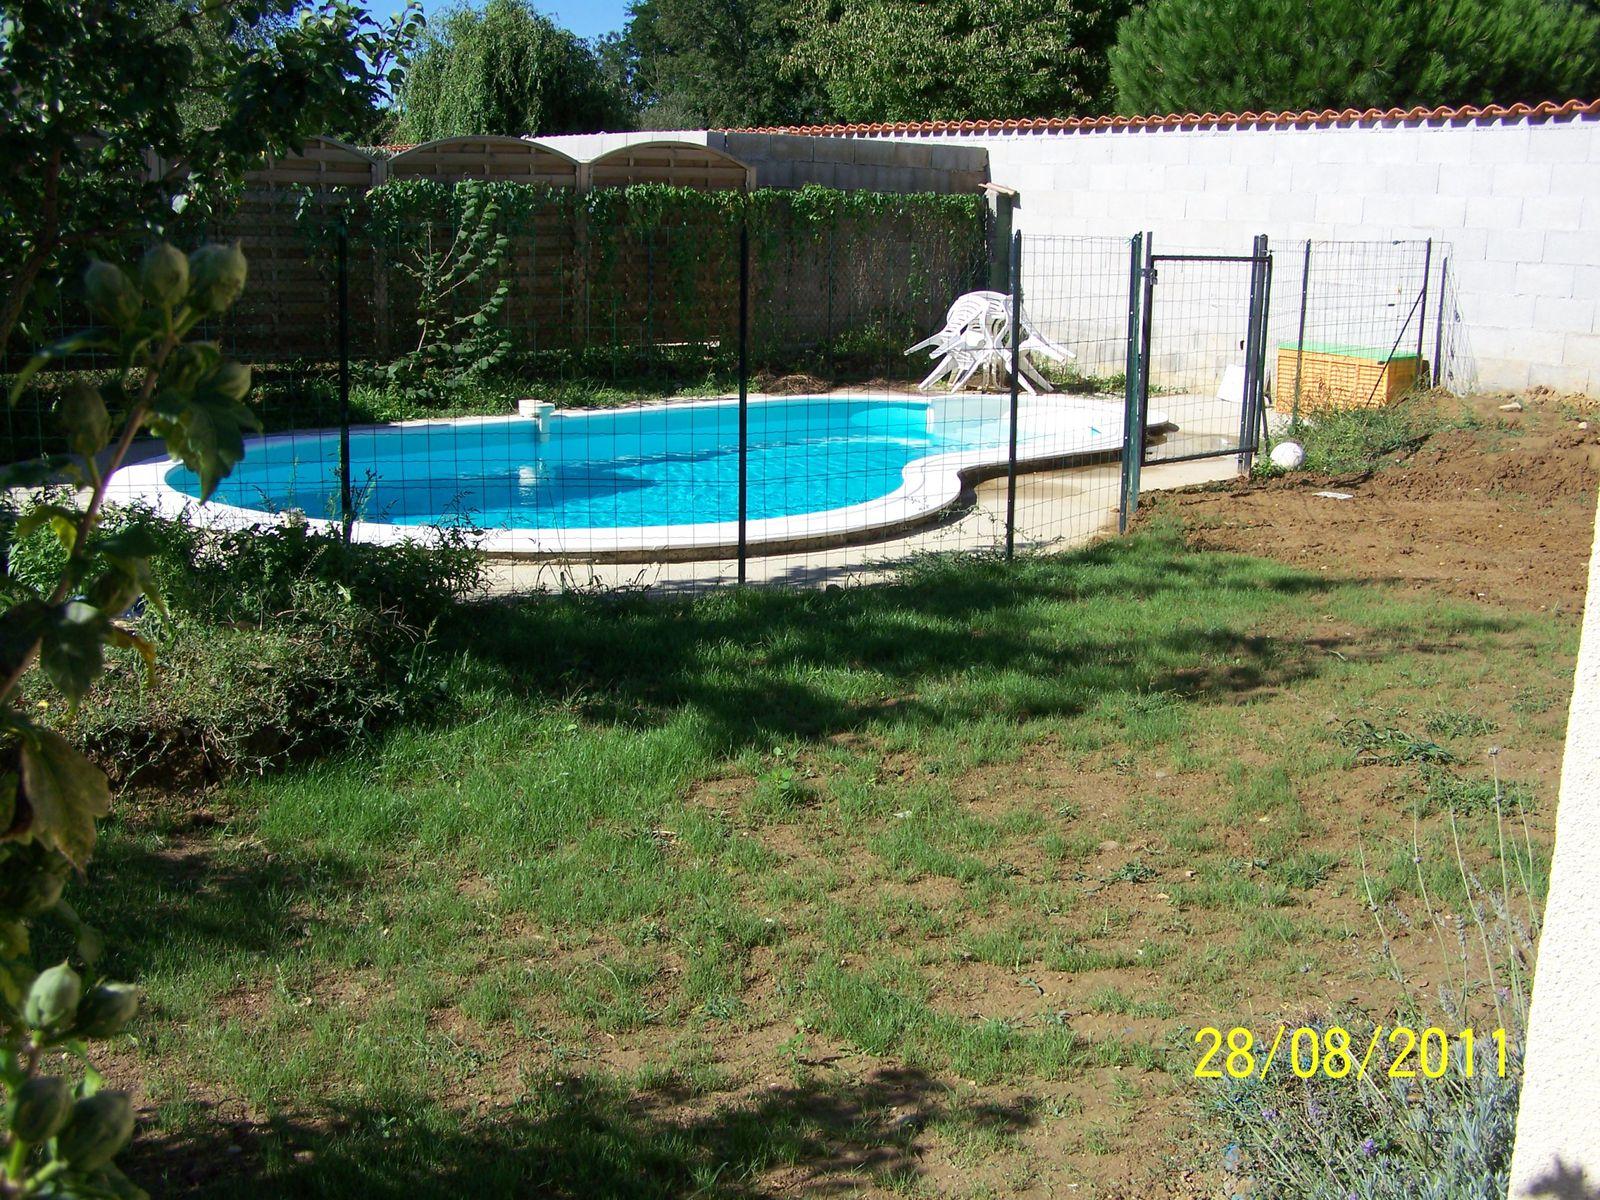 plantation du gazon montage piscine waterair. Black Bedroom Furniture Sets. Home Design Ideas